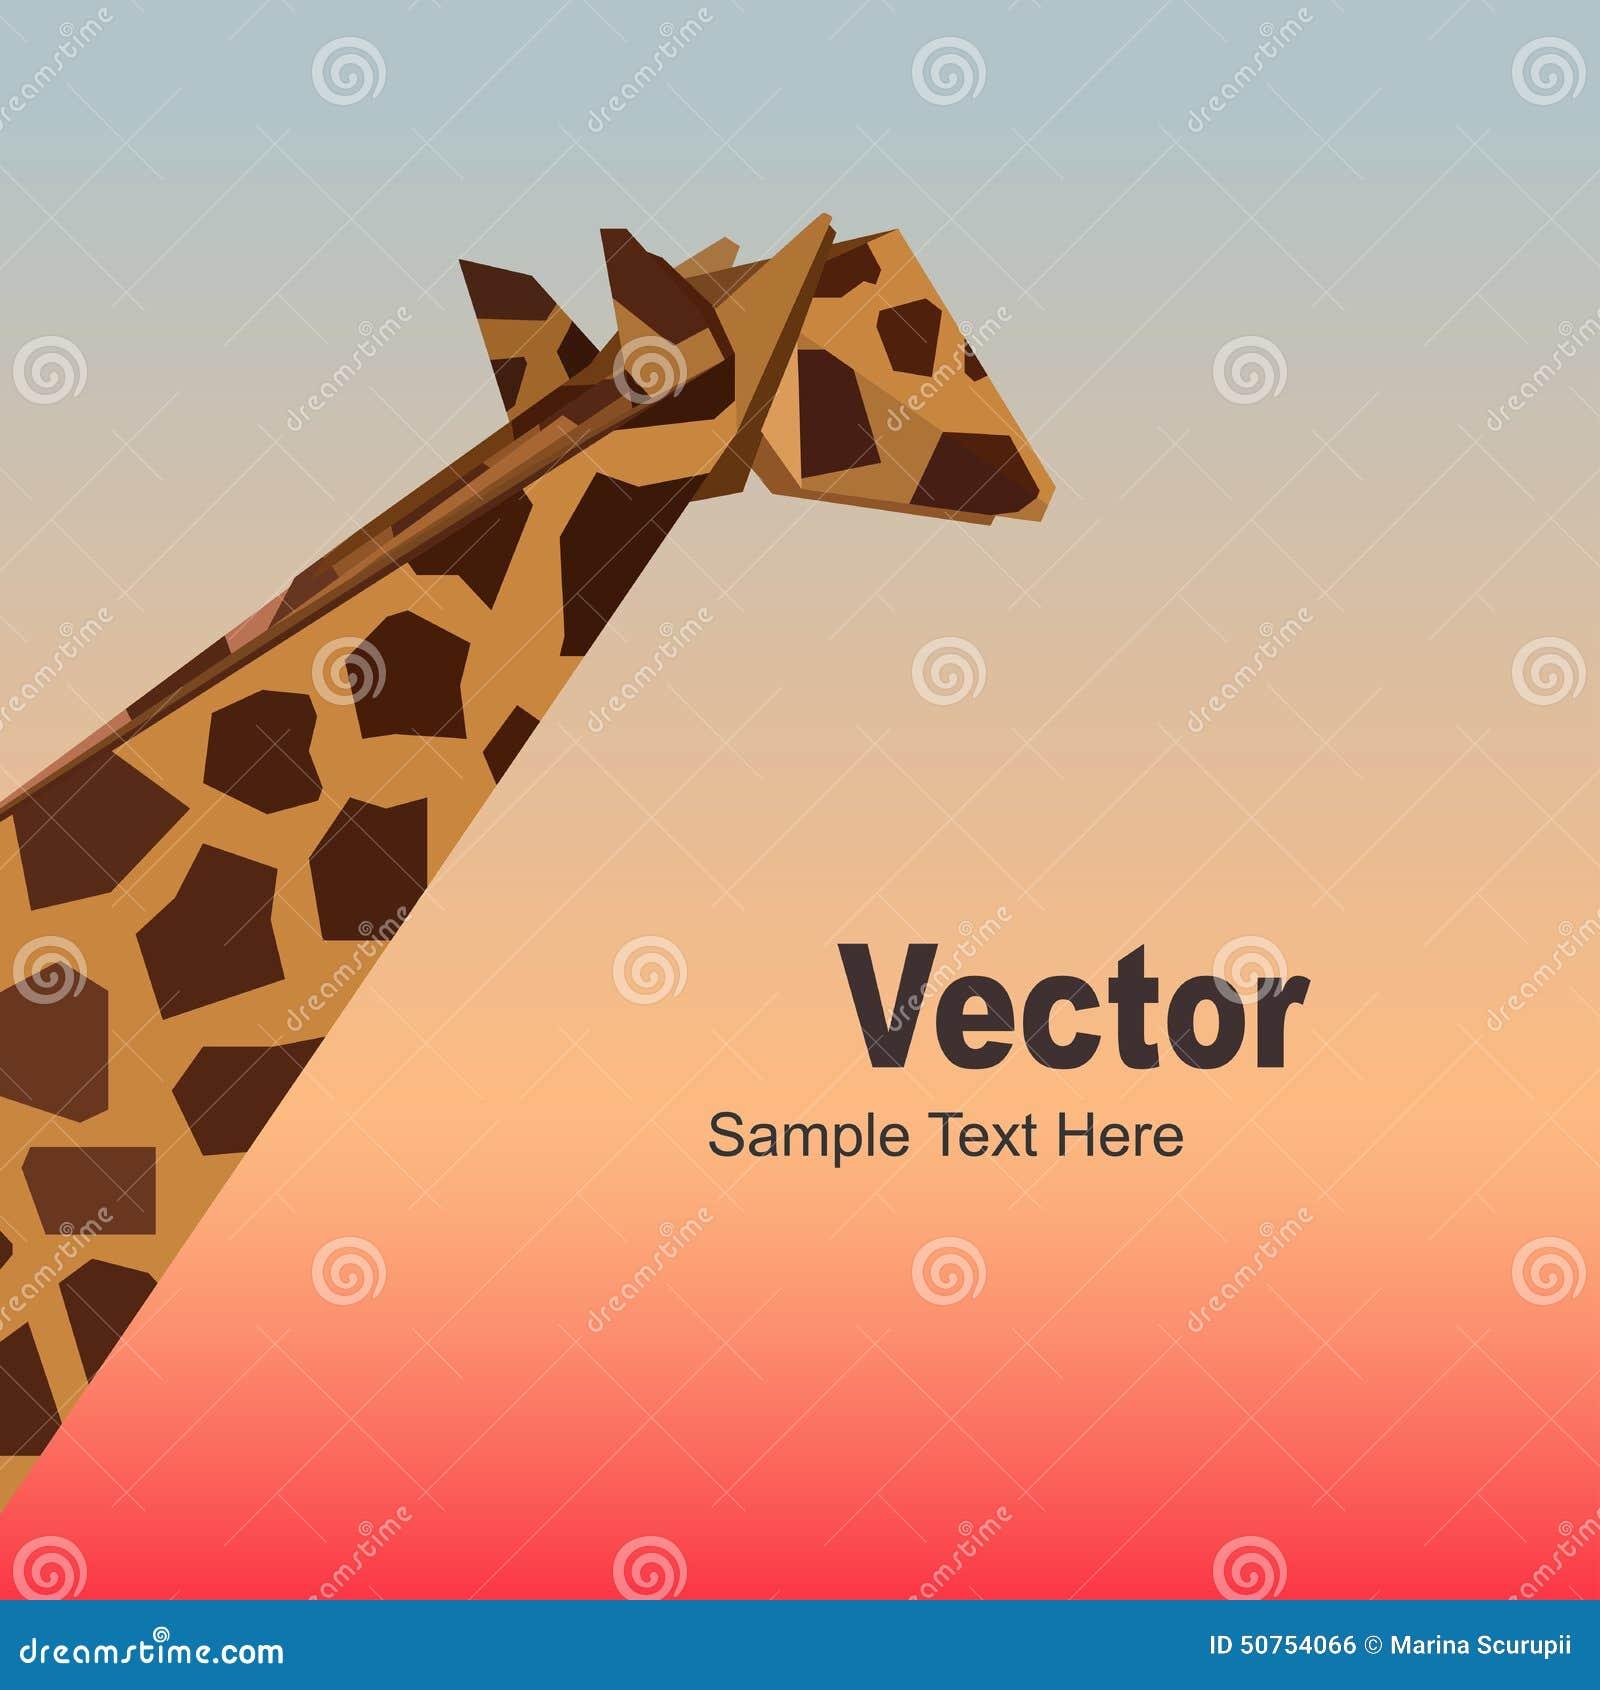 Vector Origami Giraffe Stock Illustration - Image: 50754066 - photo#11